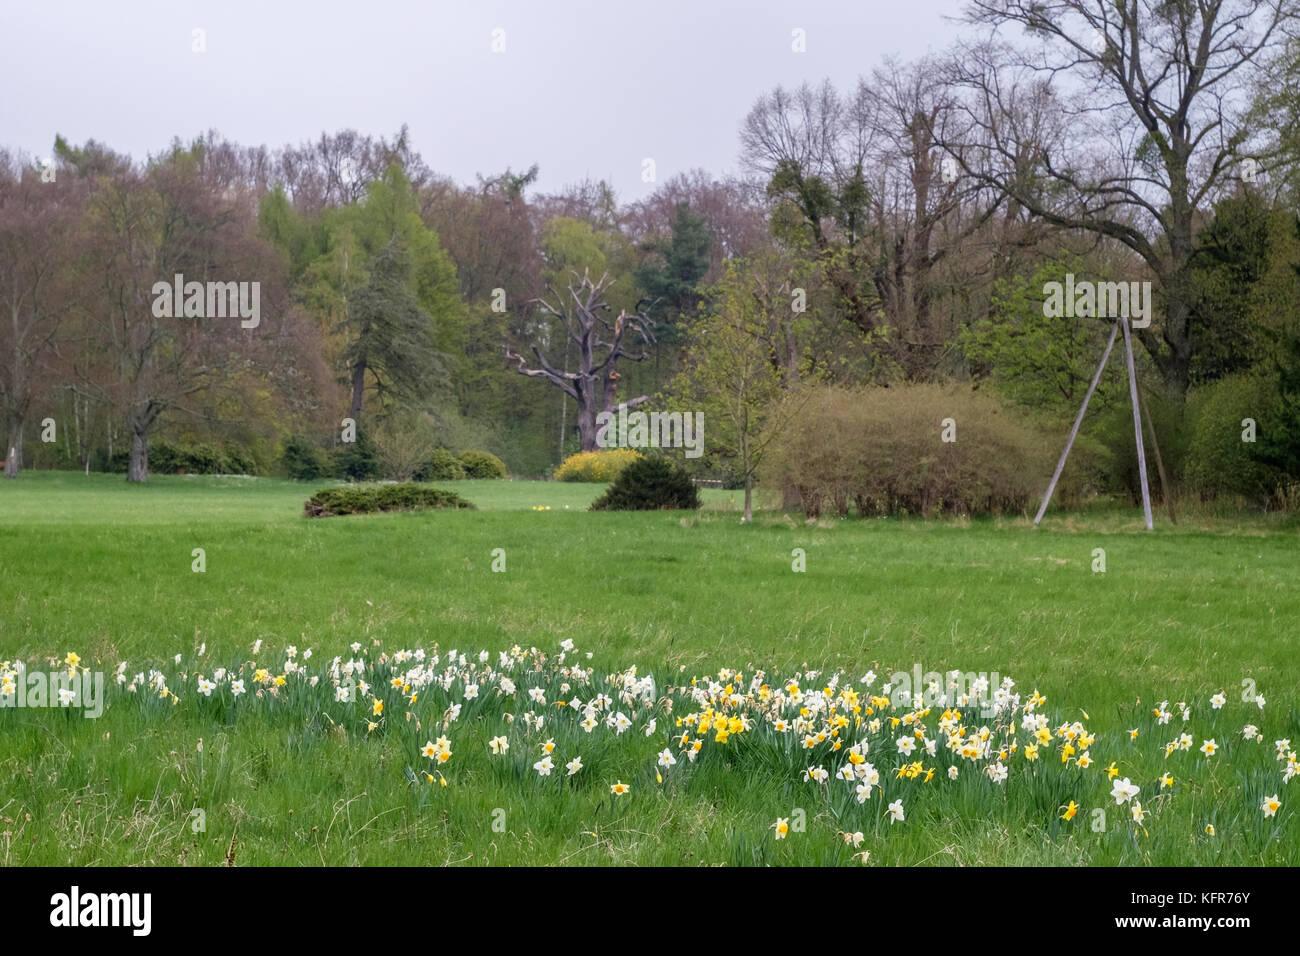 Landschaftspark Degenershausen - Stock Image